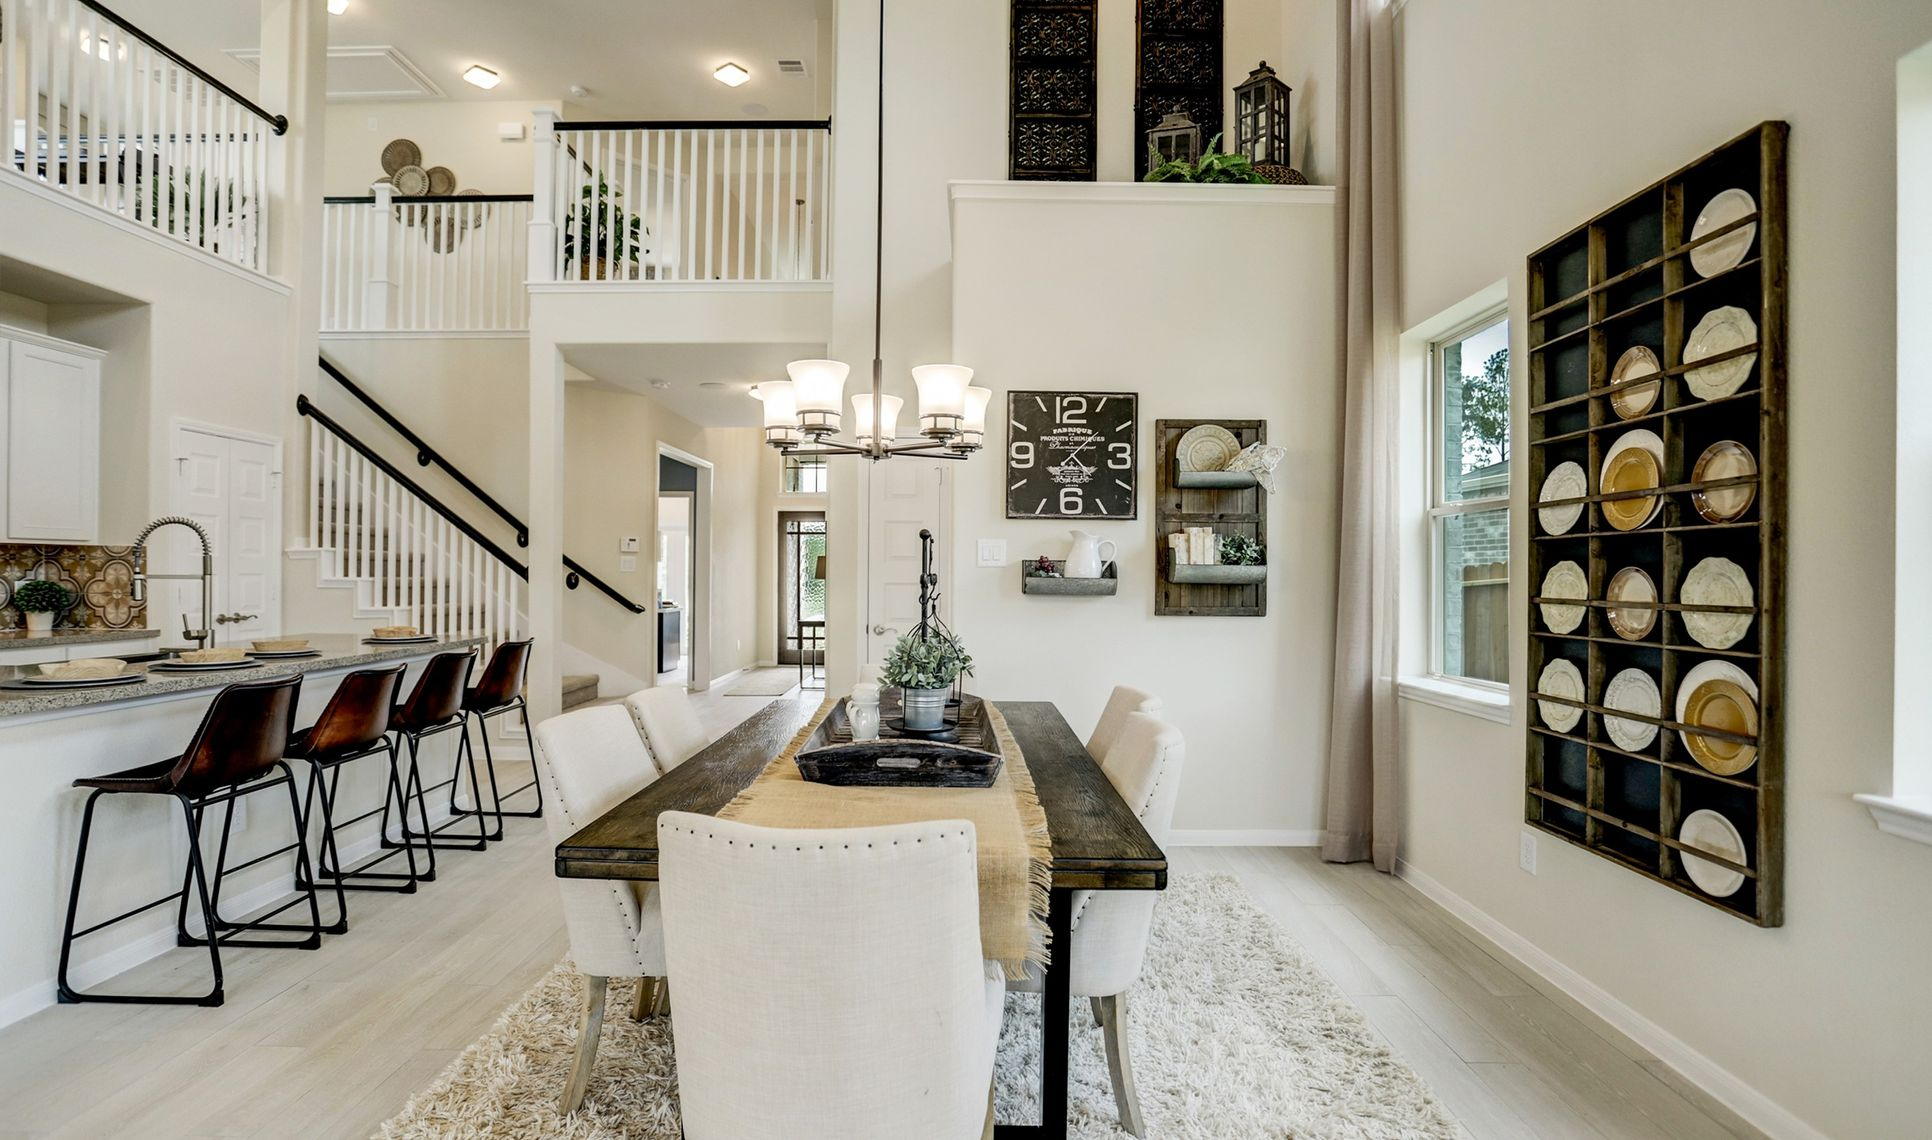 Interior:Dining area off kitchen